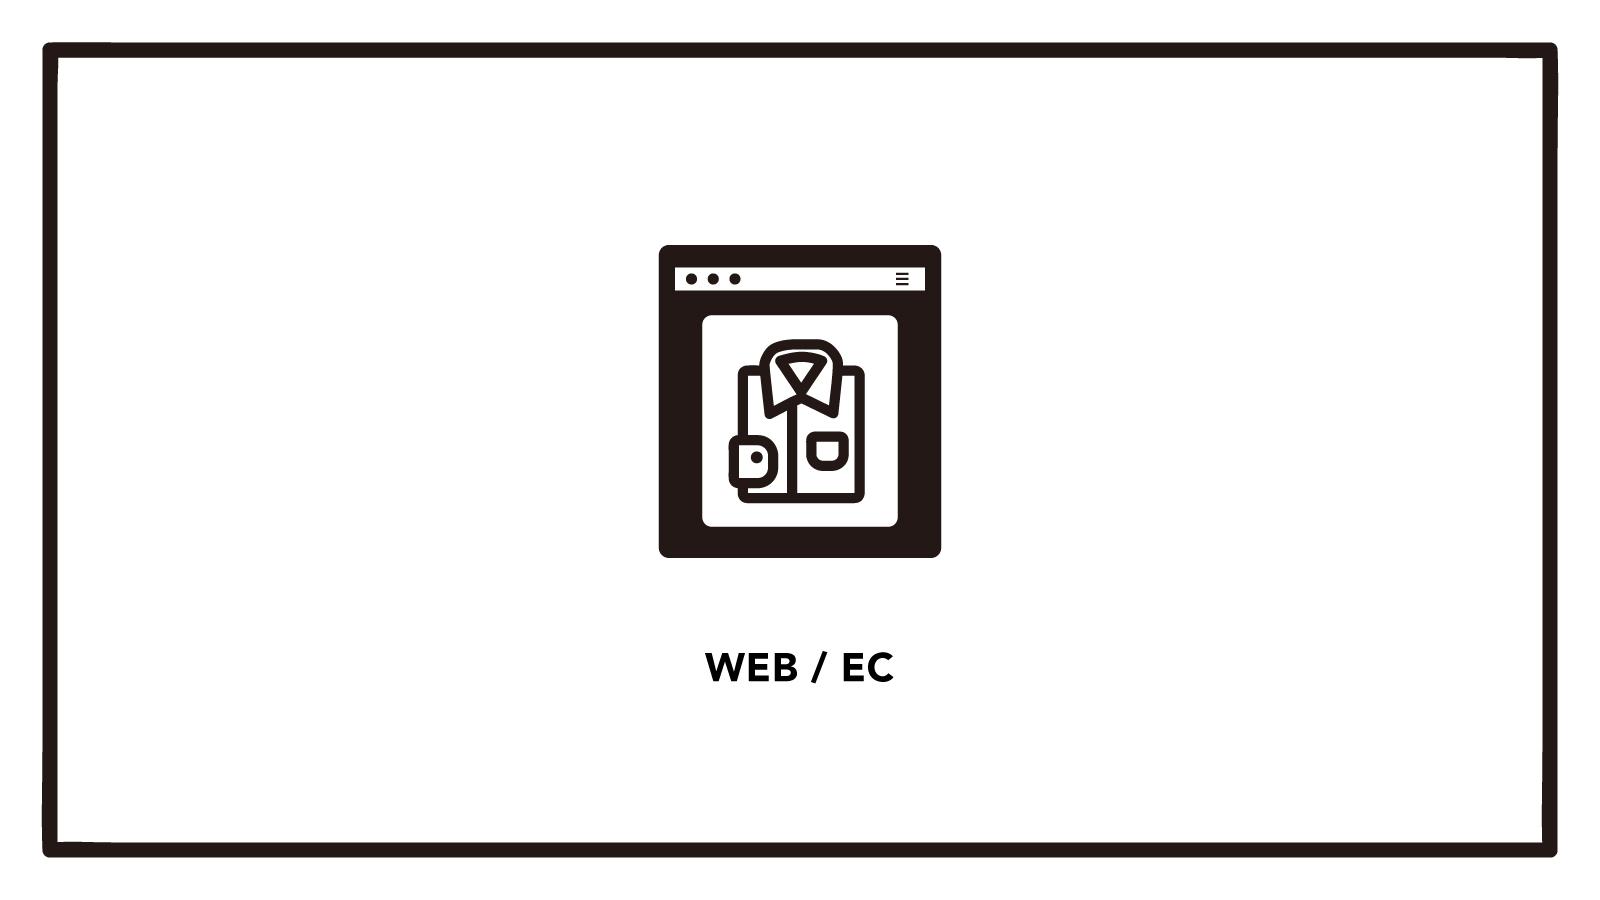 【EC運営担当】自社EC事業においてサイトの構築を担当!※未経験OKのカバー写真